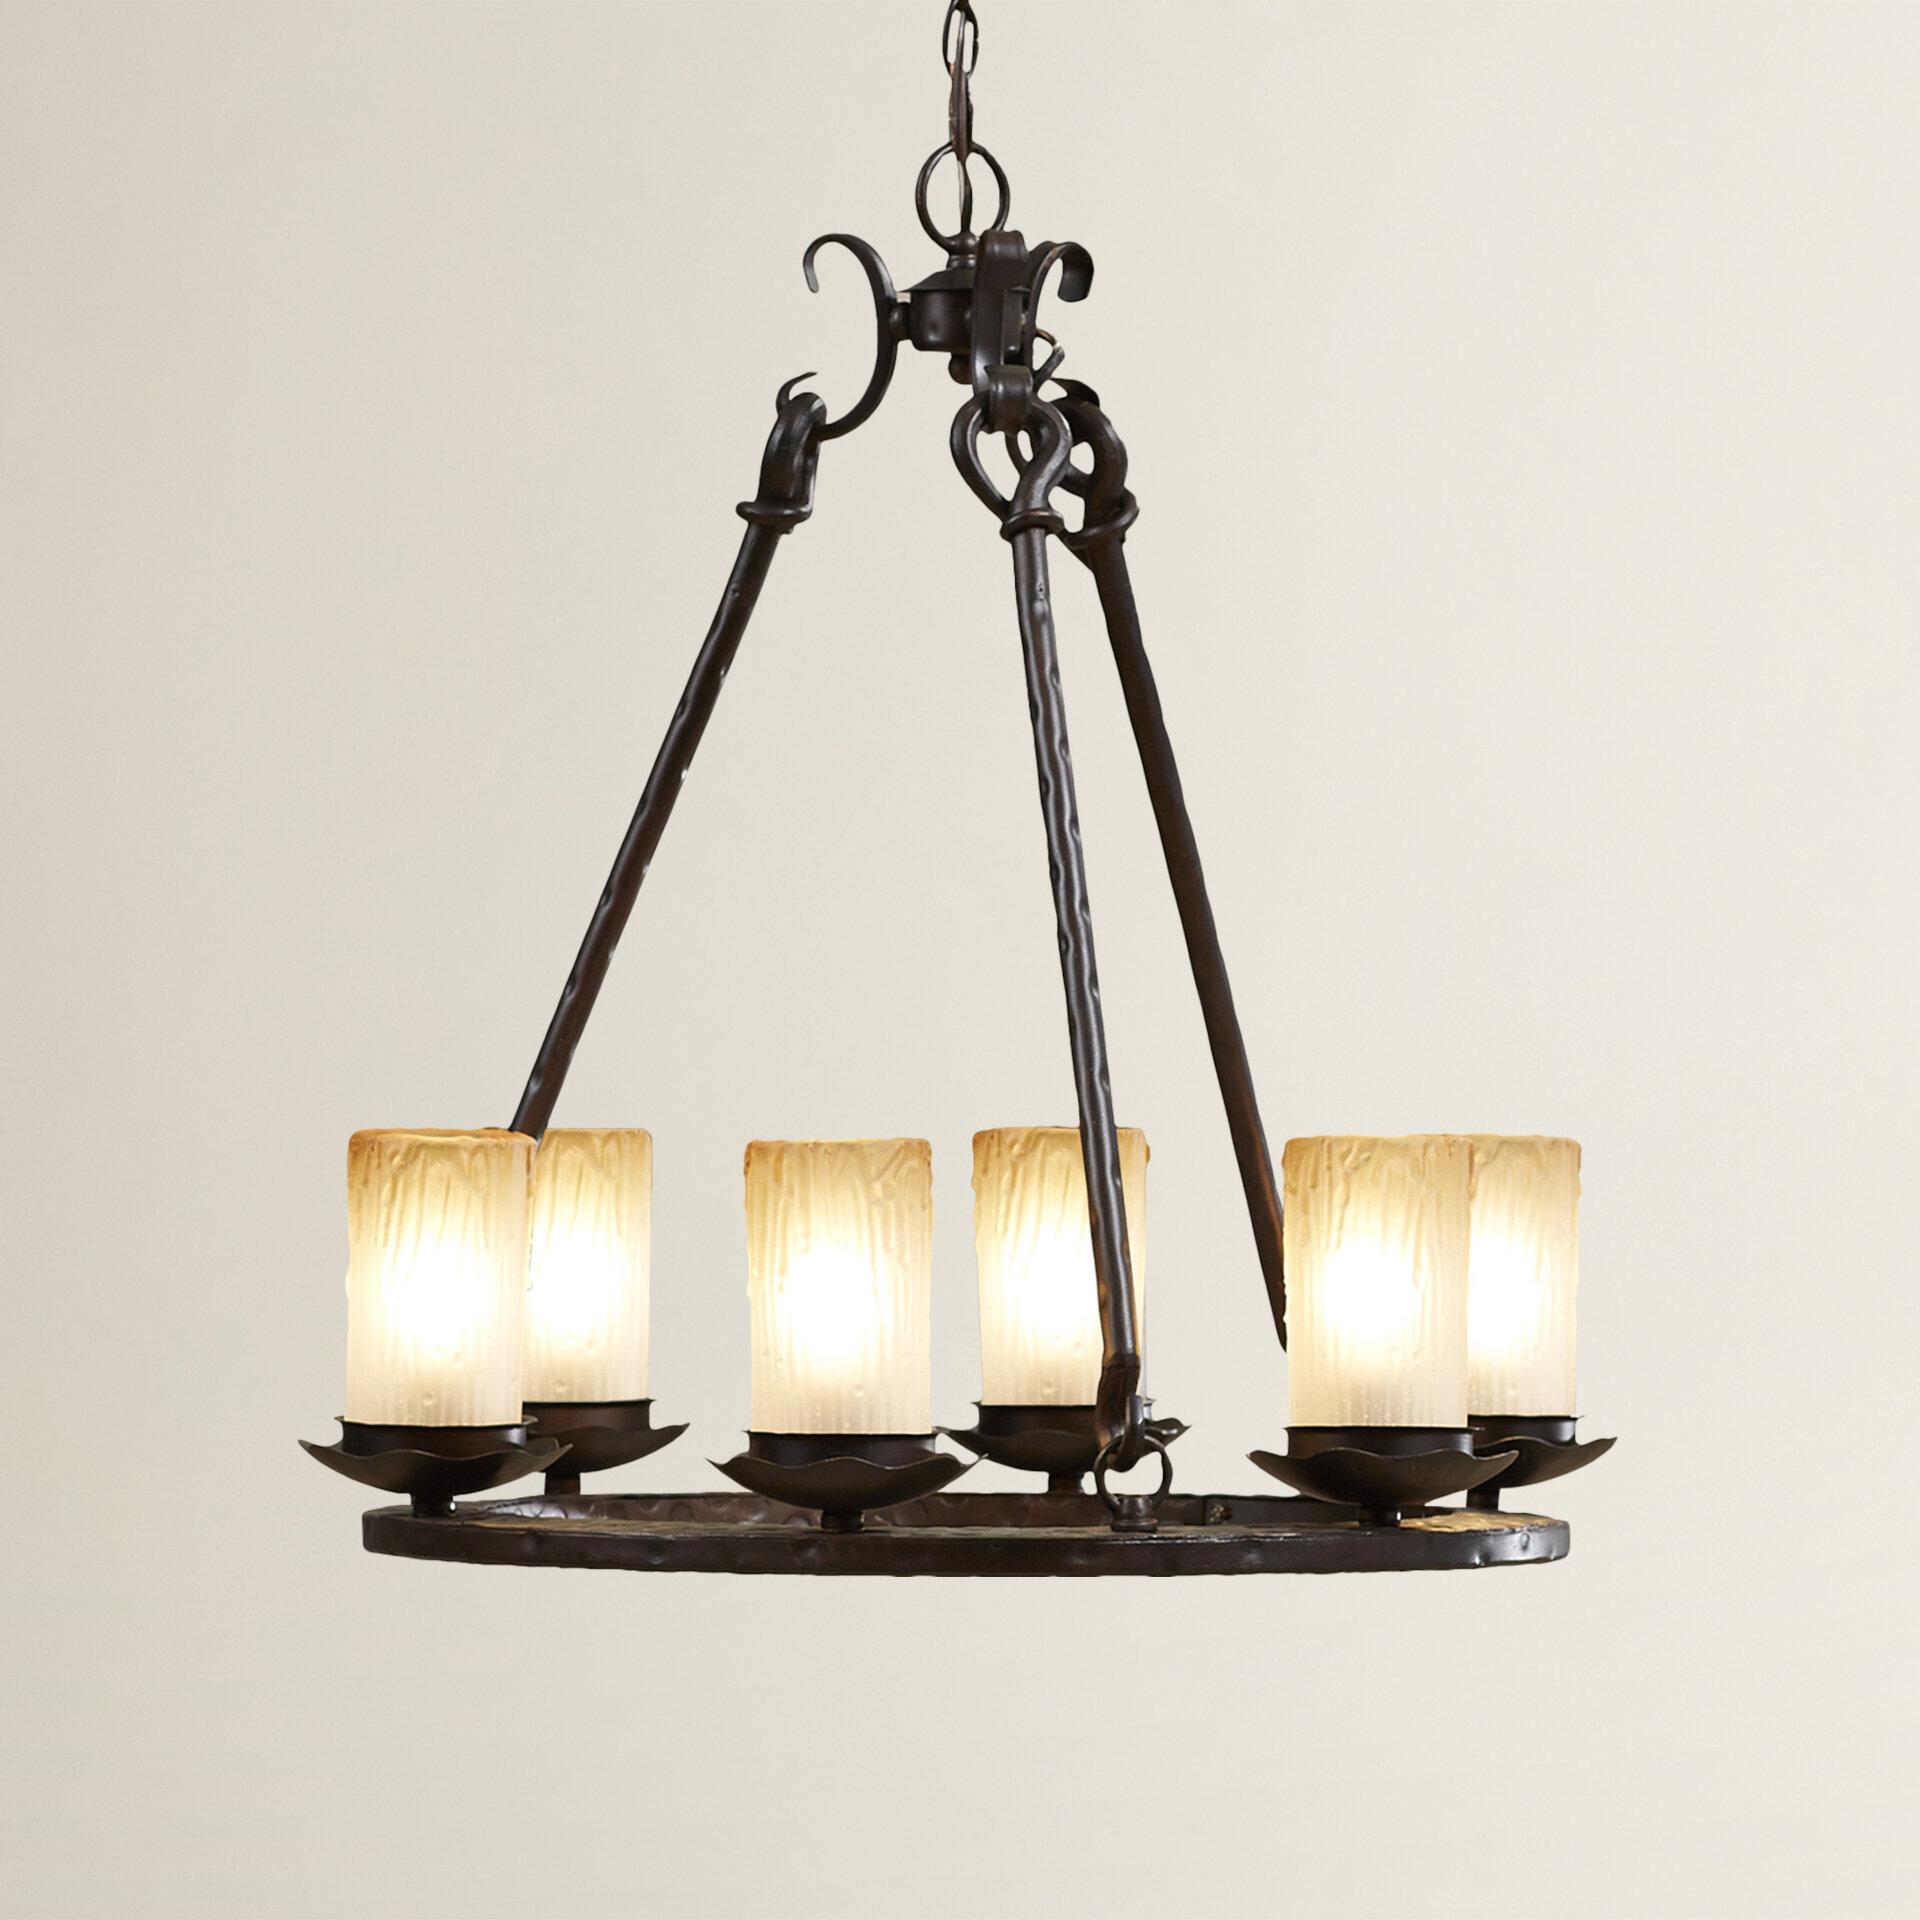 Rowan 6 Light Shaded Chandelier & Reviews